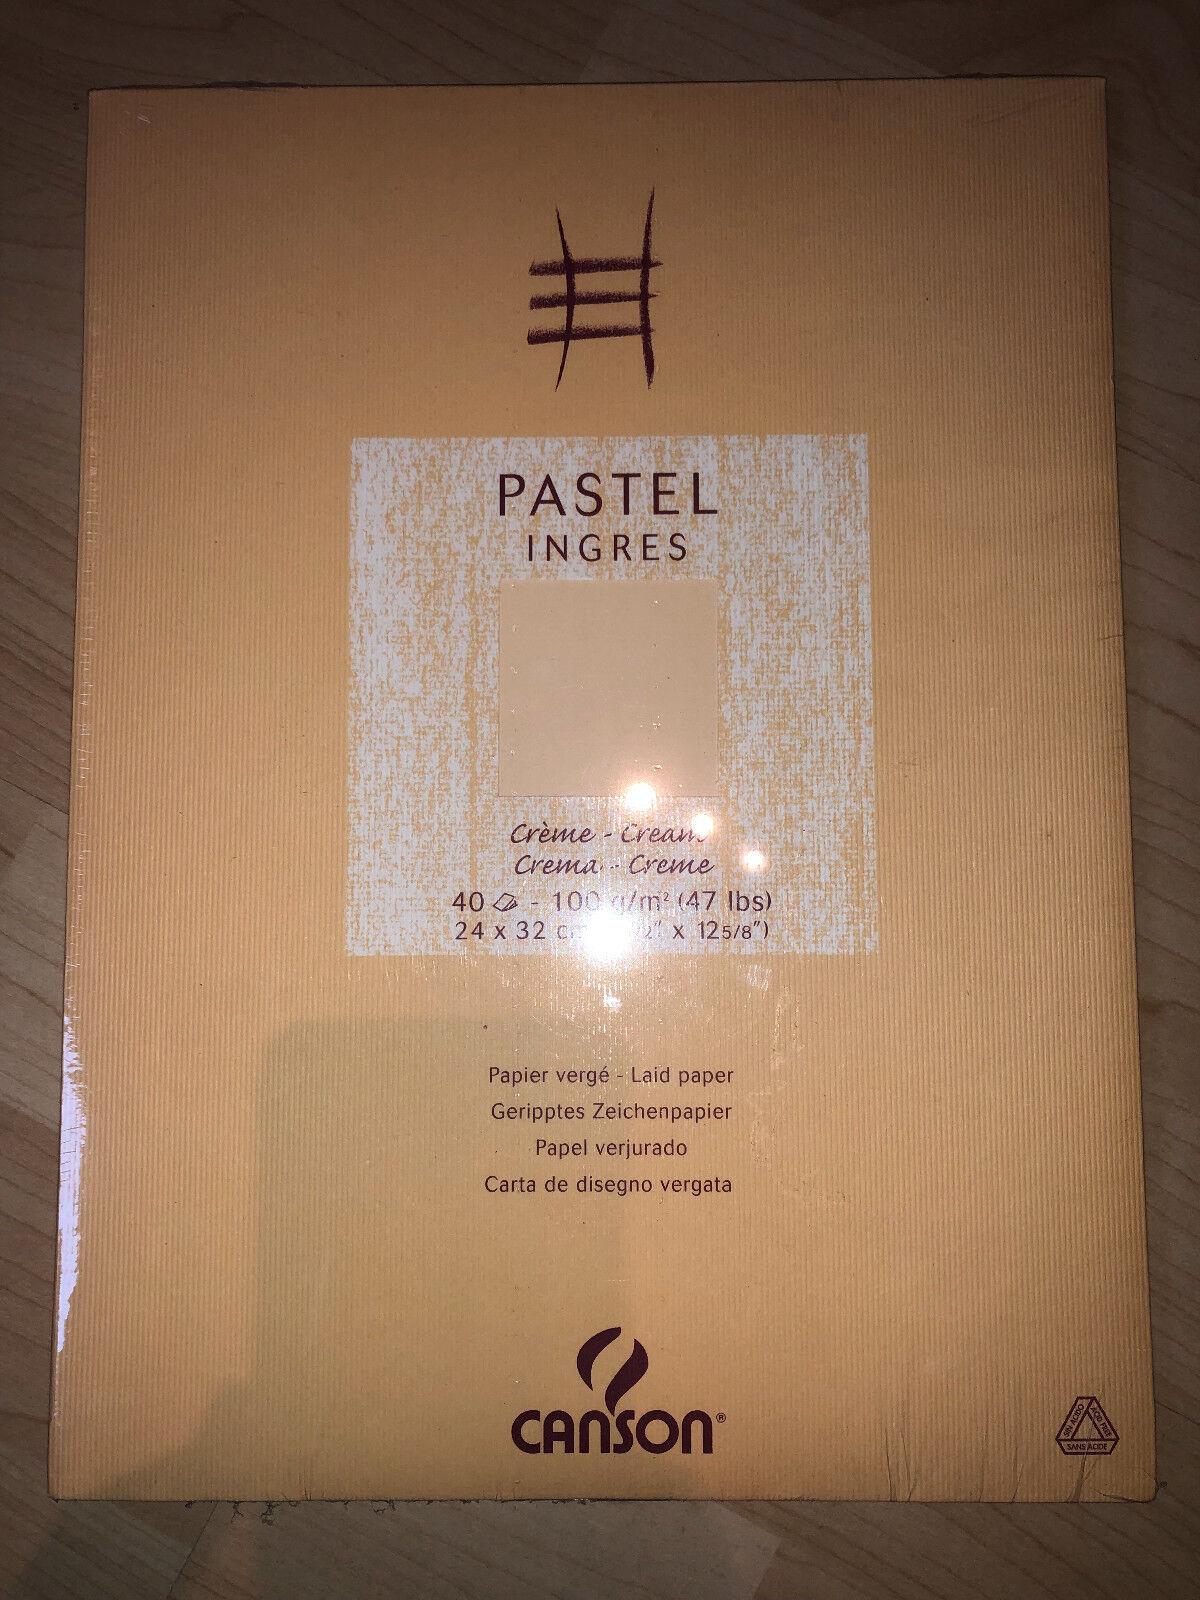 40 Bl. Pastellpapier Canson Ingres Pastellblock 24x32cm 100g/qm Creme